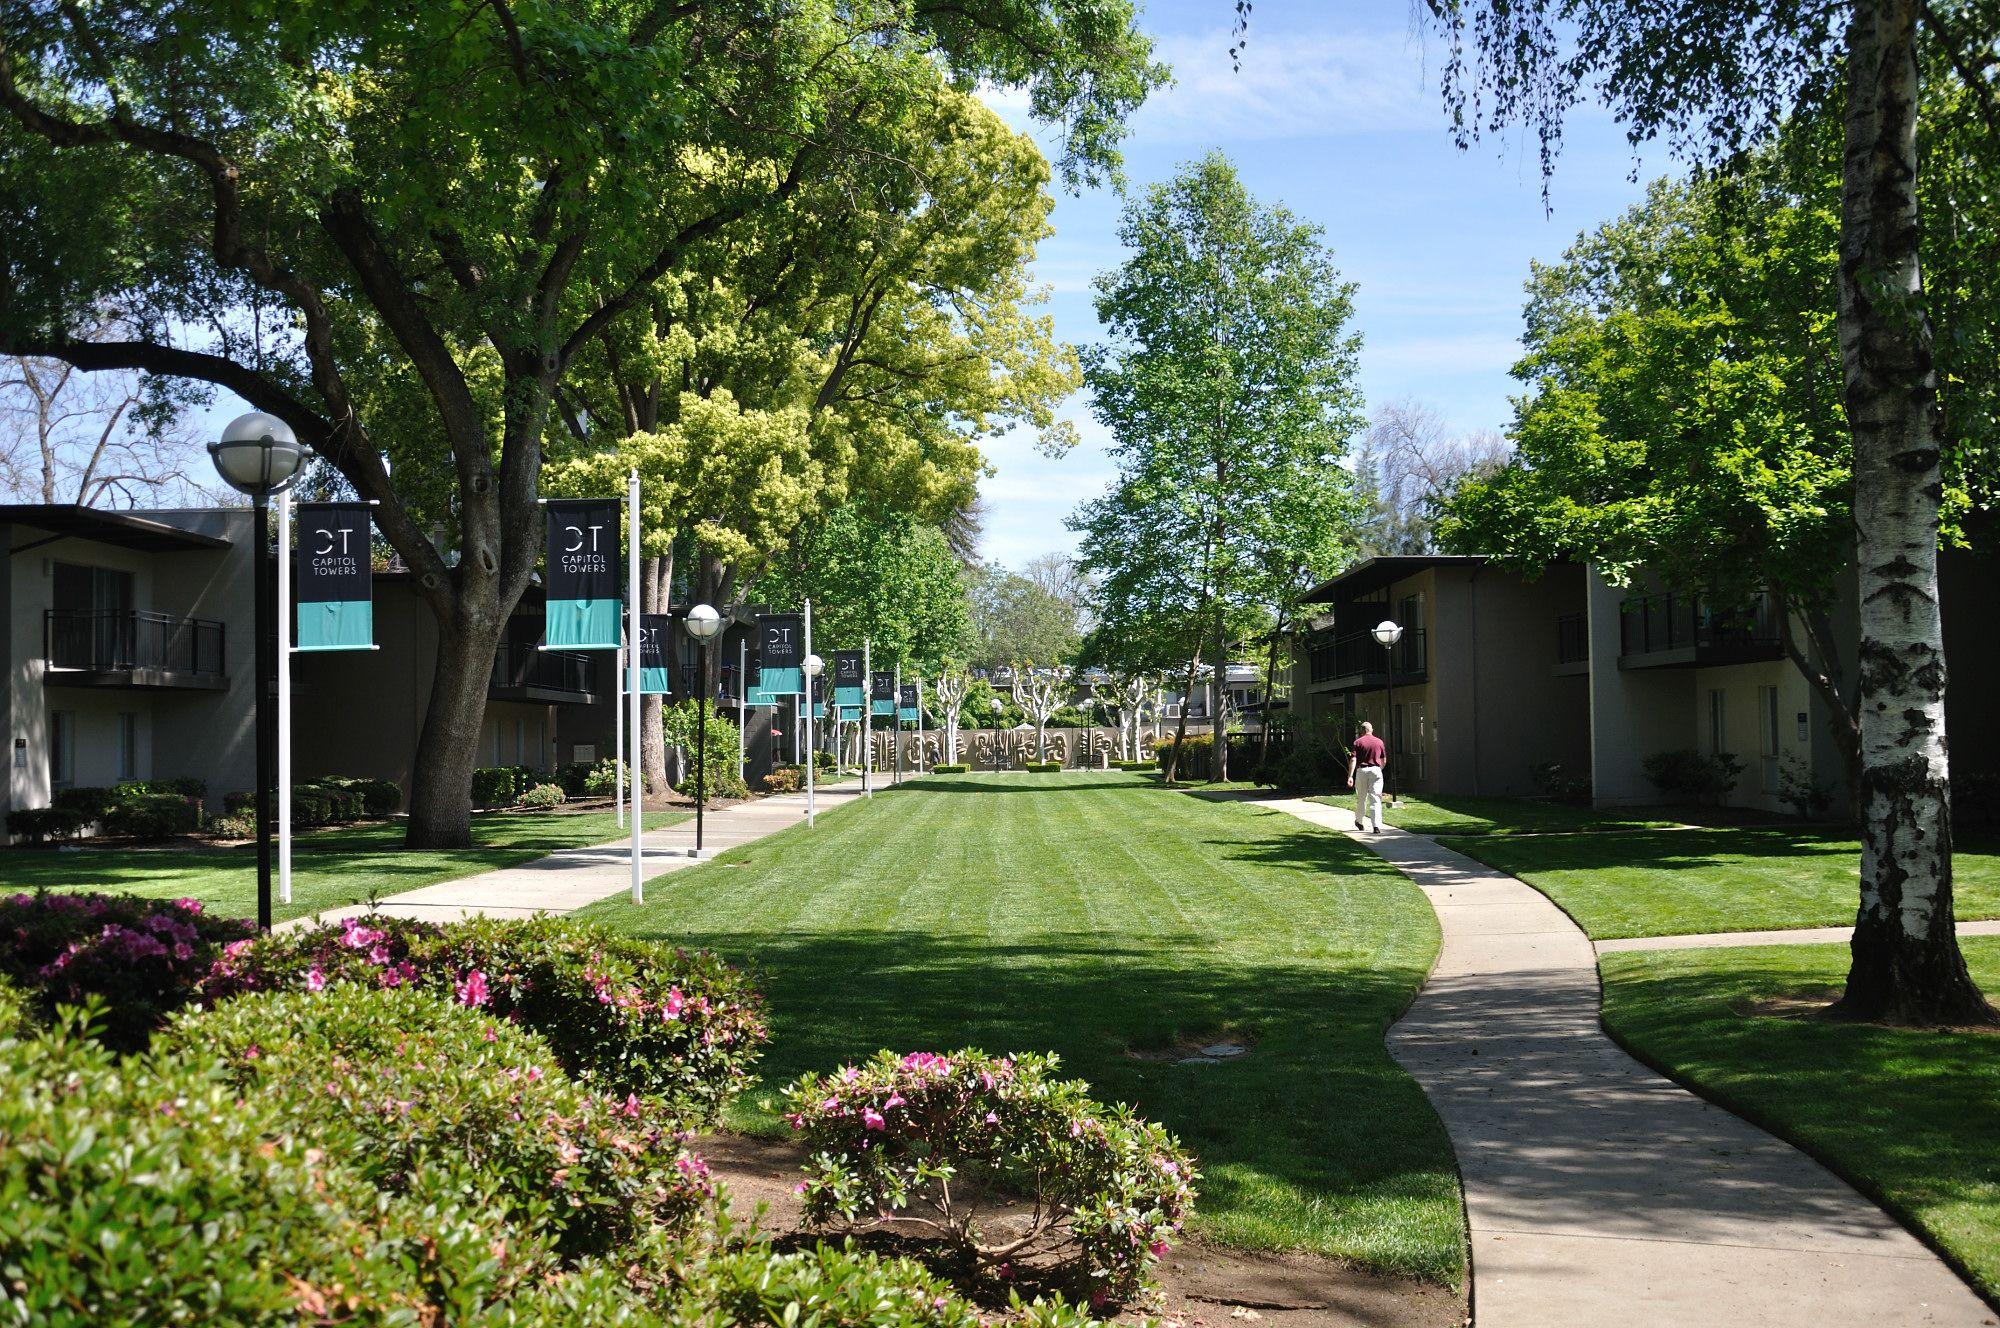 Lawrence Halprin Legacy Capital Towers Apartments Sacramento Ca Photo Courtesy Of Page Turnbull Lawrence Halprin Landscape Architect Landscape